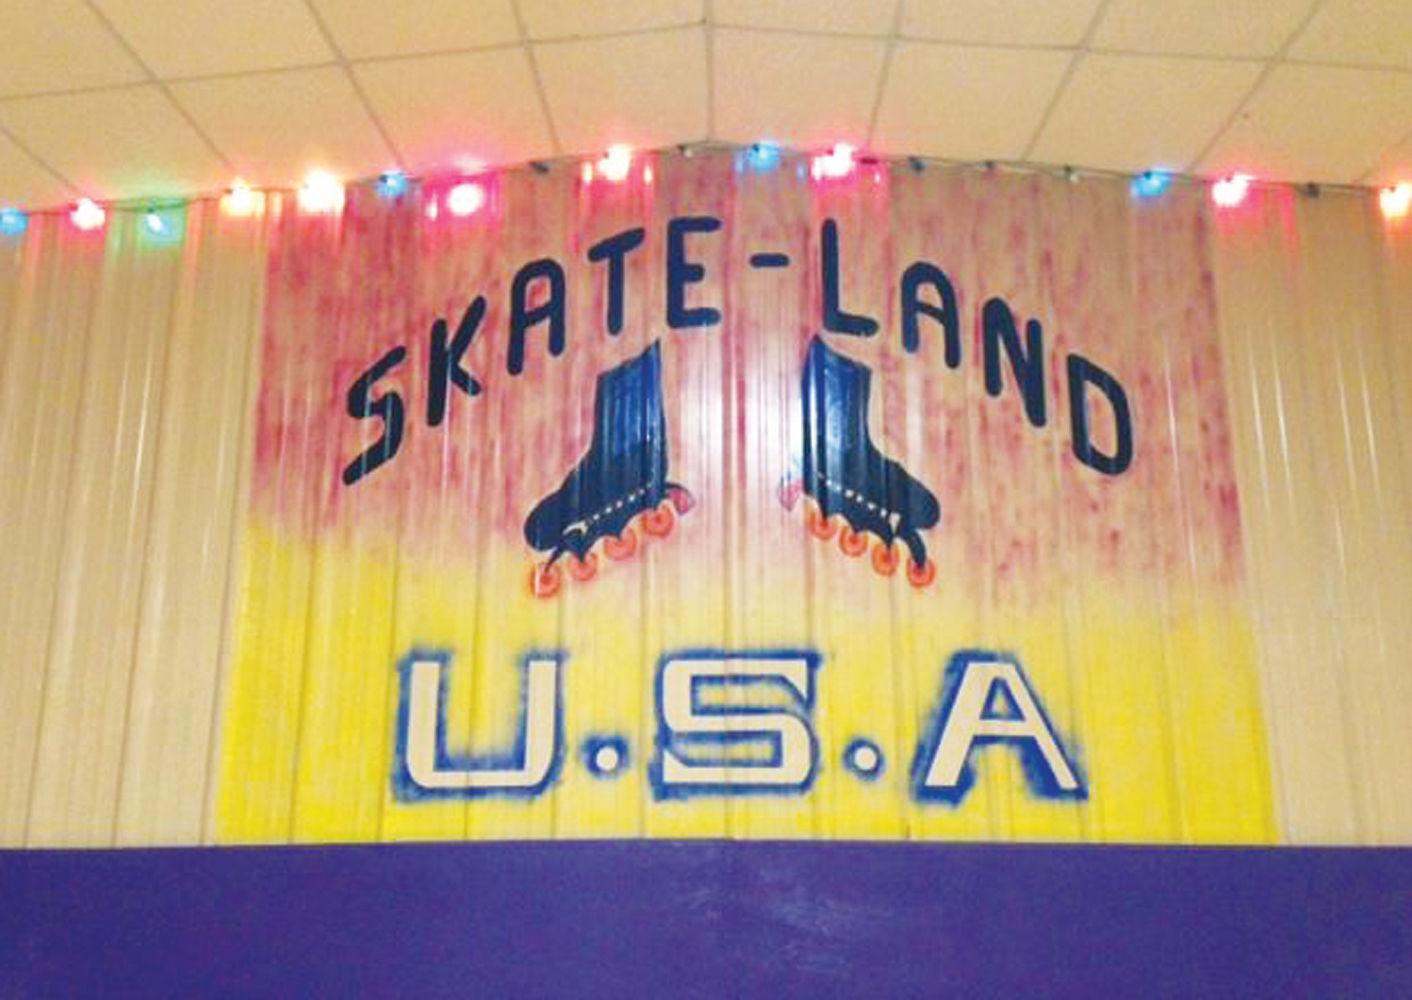 Fun on wheels: SkateLand USA  delights generations of skaters | Jacksonville Progress